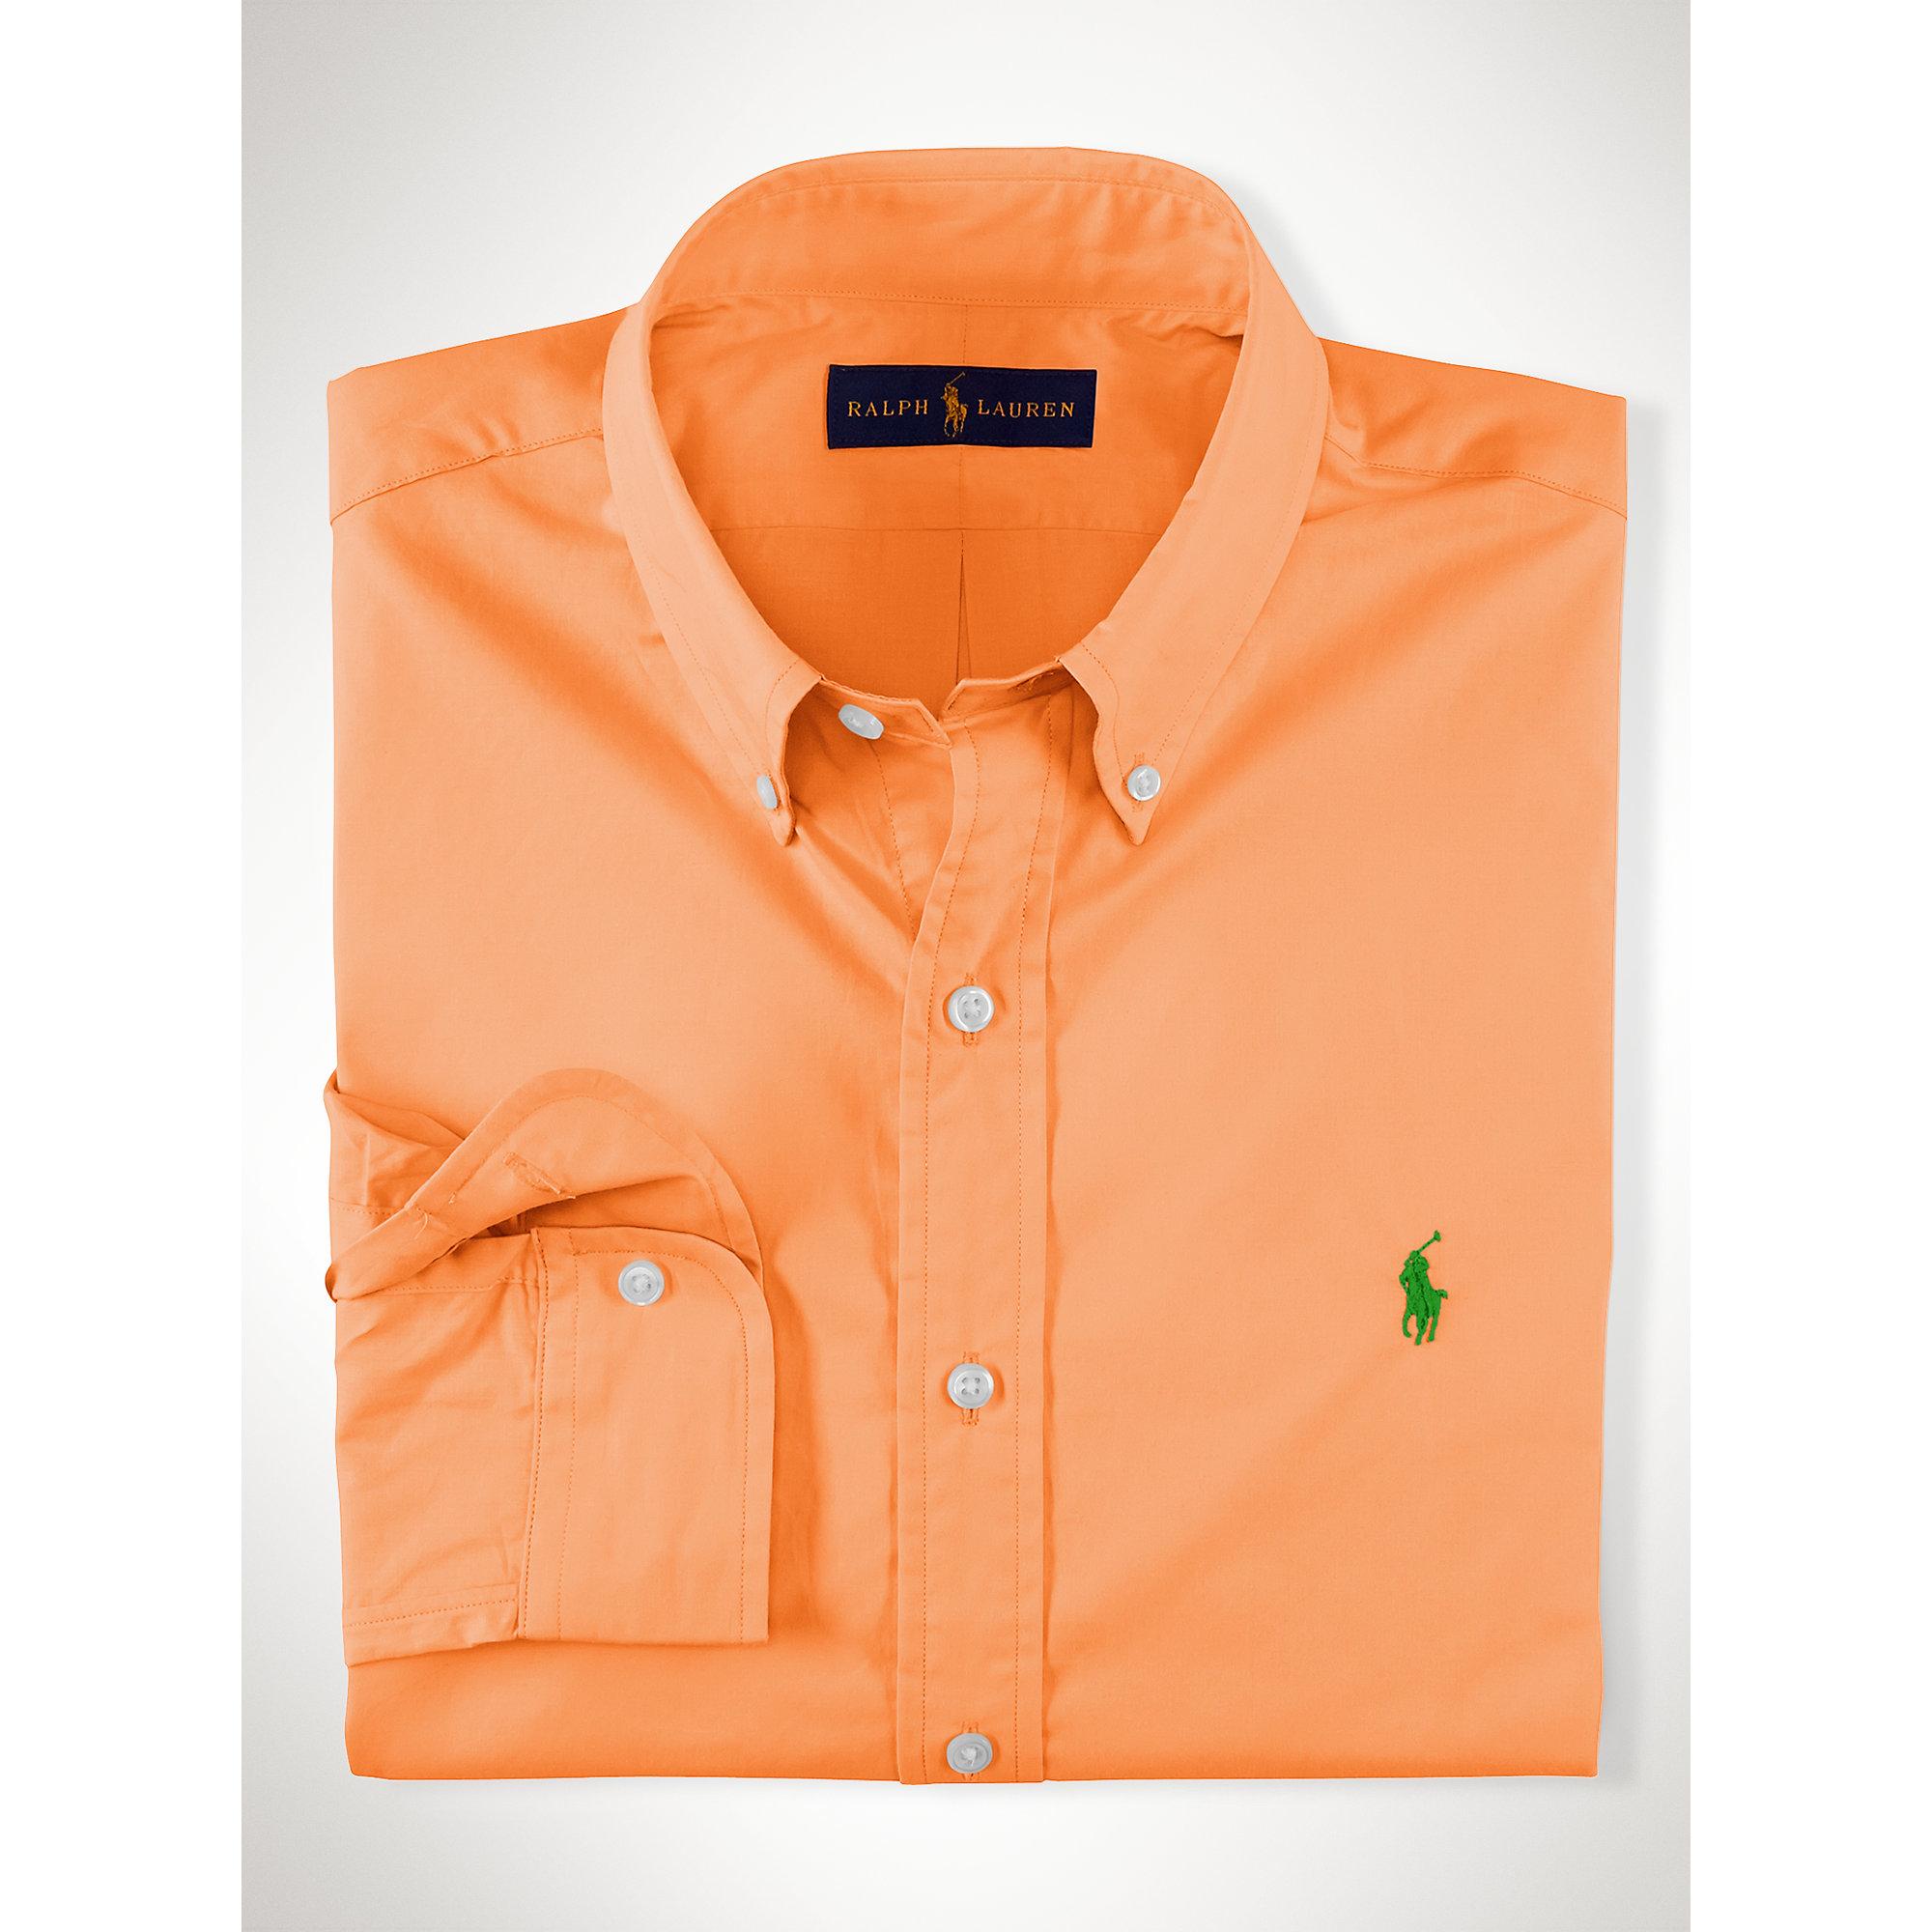 e2d4bc696 Polo Ralph Lauren Slim-fit Solid Poplin Shirt in Orange for Men - Lyst